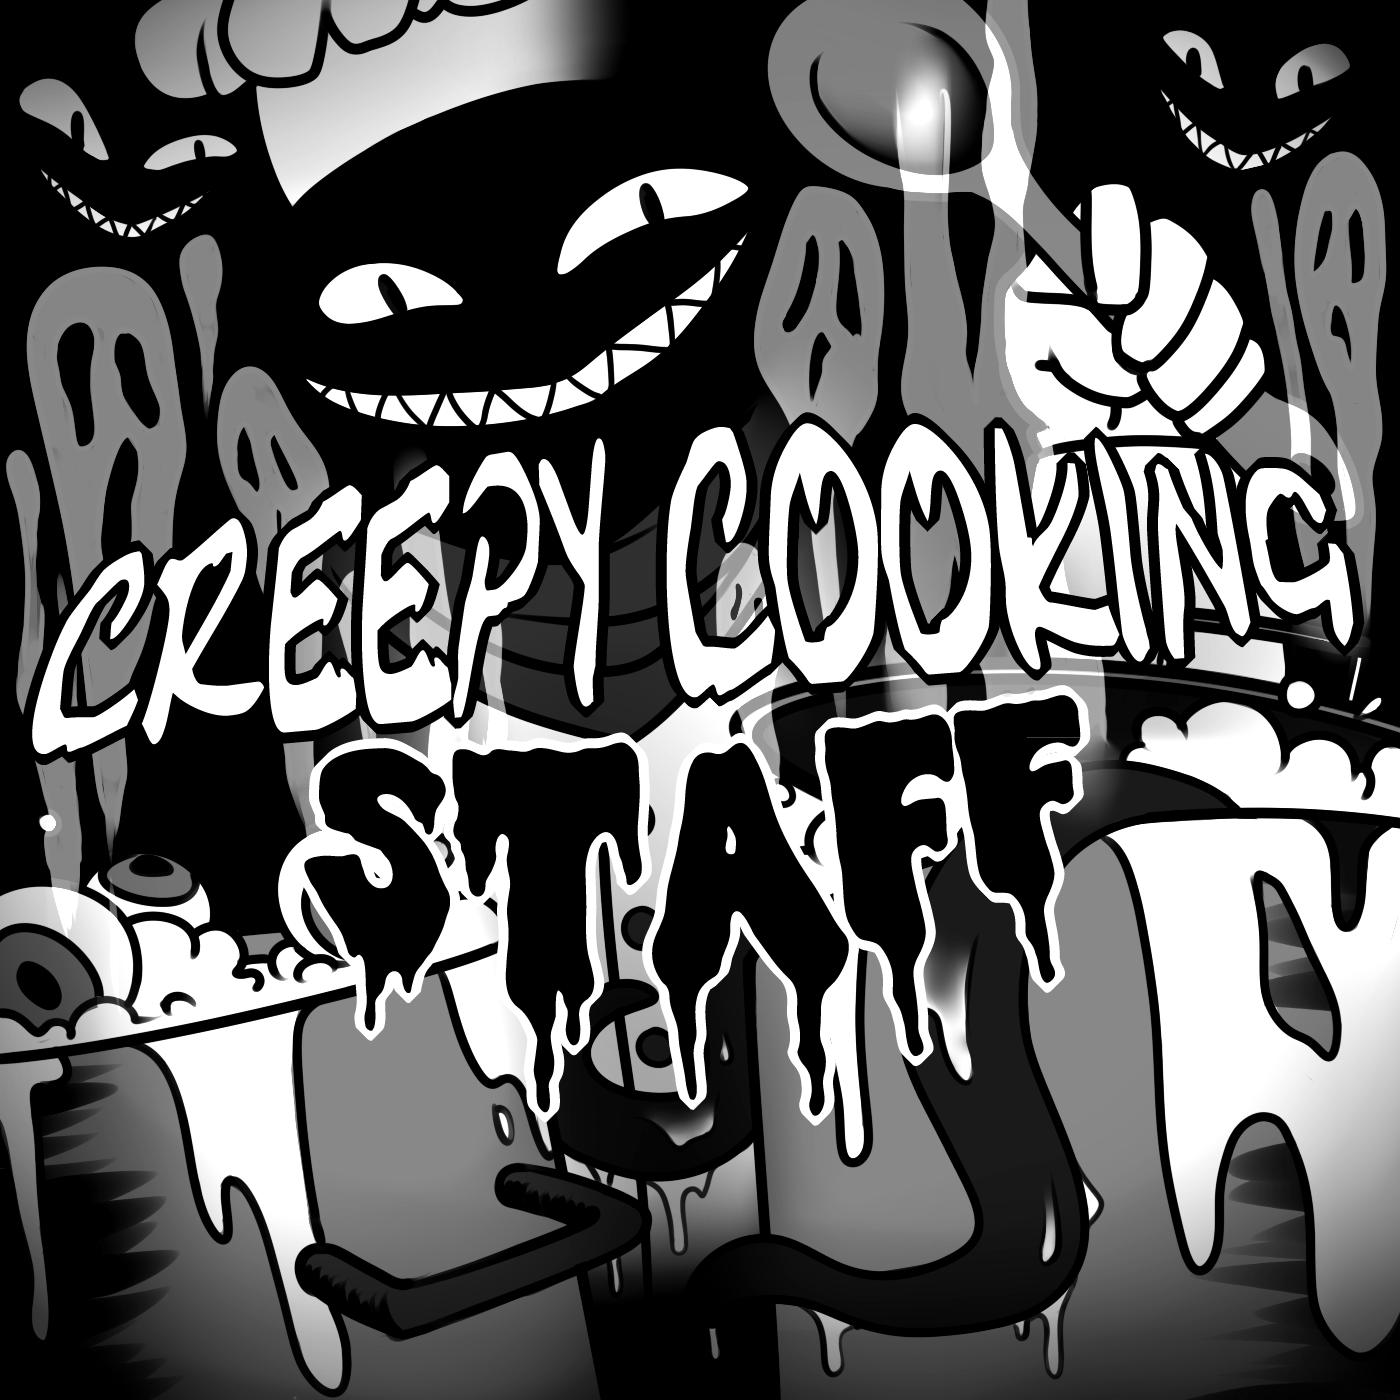 CreepyCookingStaff_podcast_art